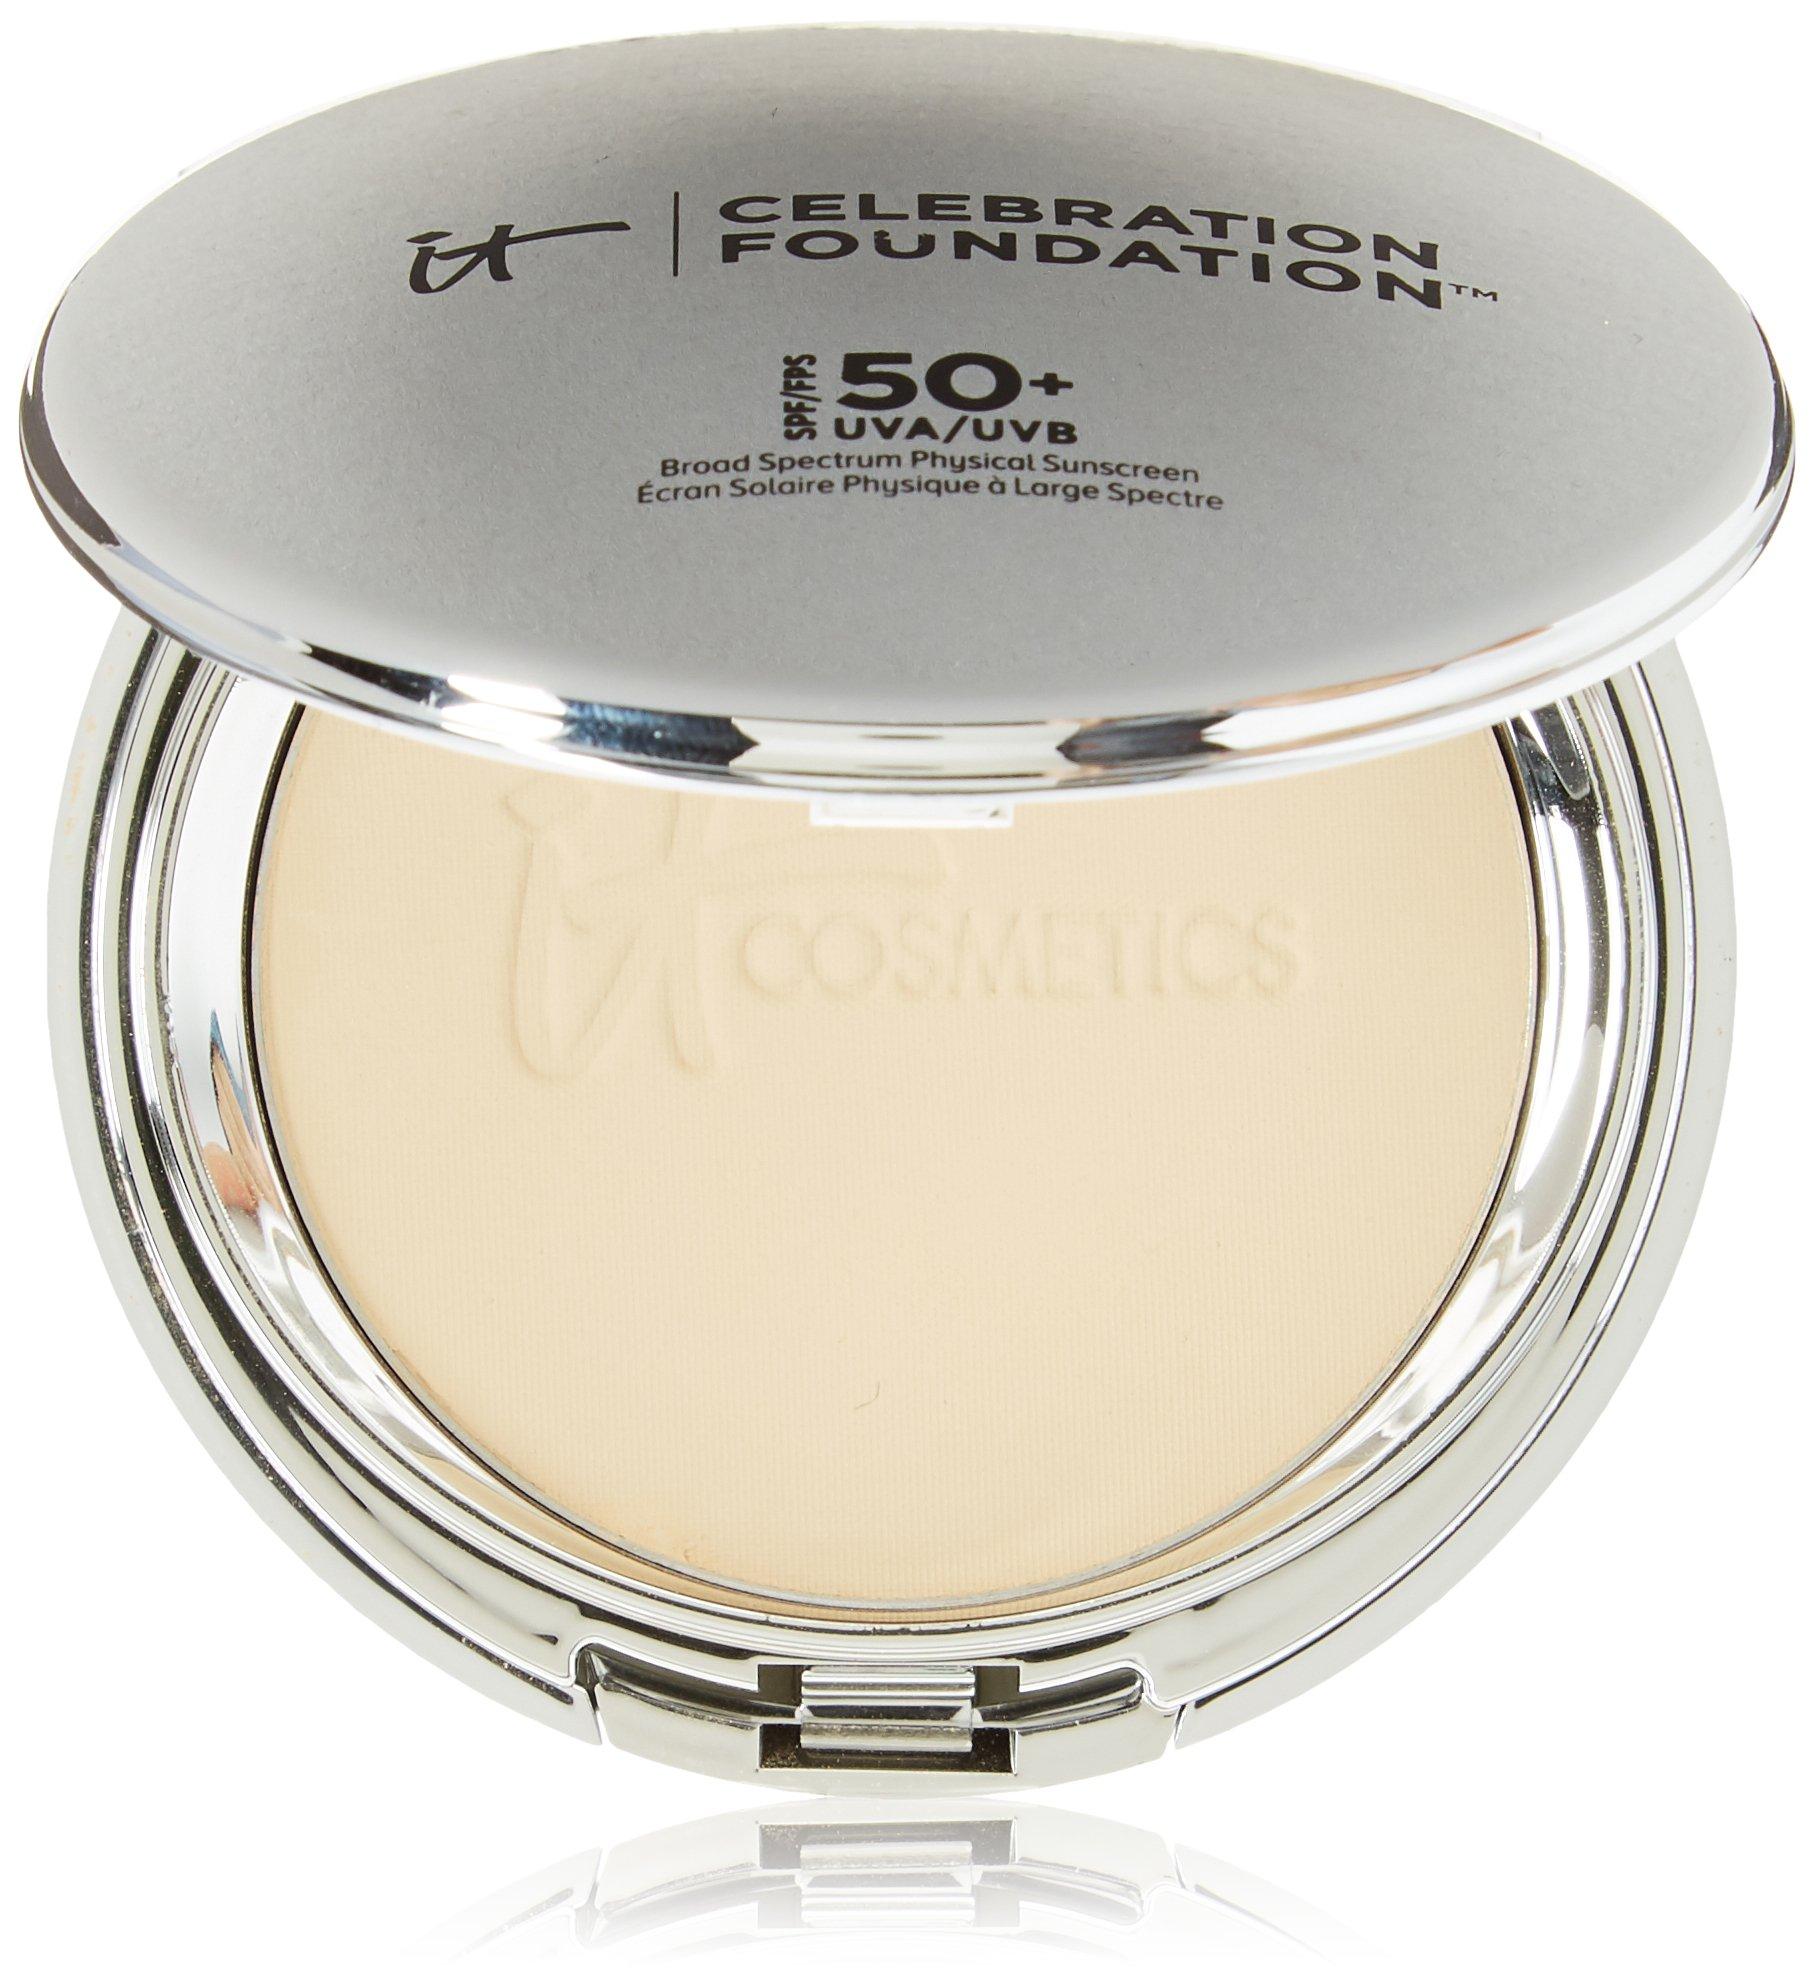 It Cosmetics Celebration Foundation Full Coverage Anti-Aging Hydrating Powder Foundation with SPF 50 in Medium 0.30 OZ